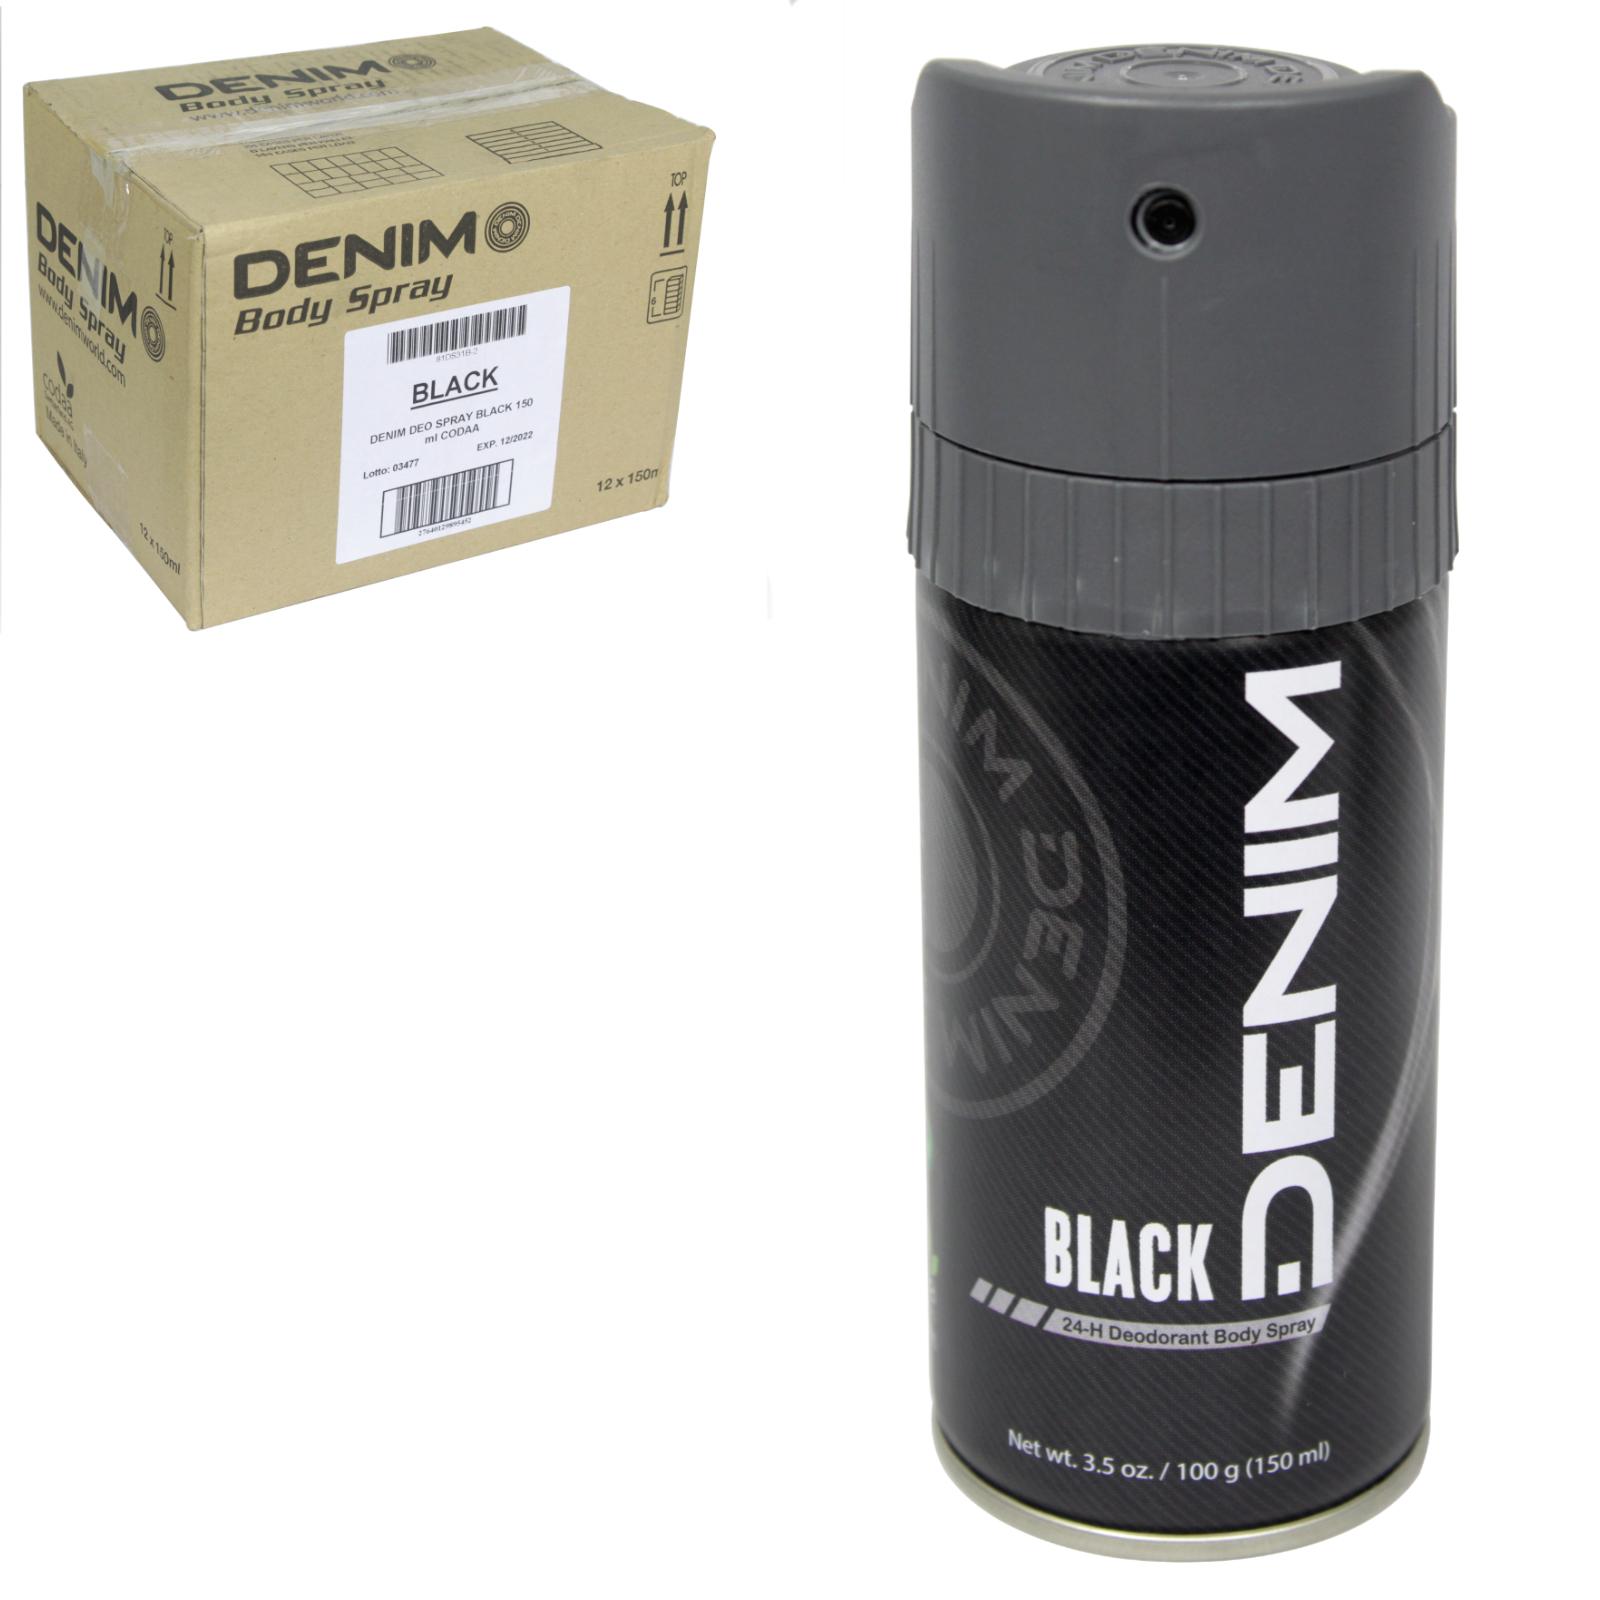 DENIM BODYSPRAY 150ML BLACK X12